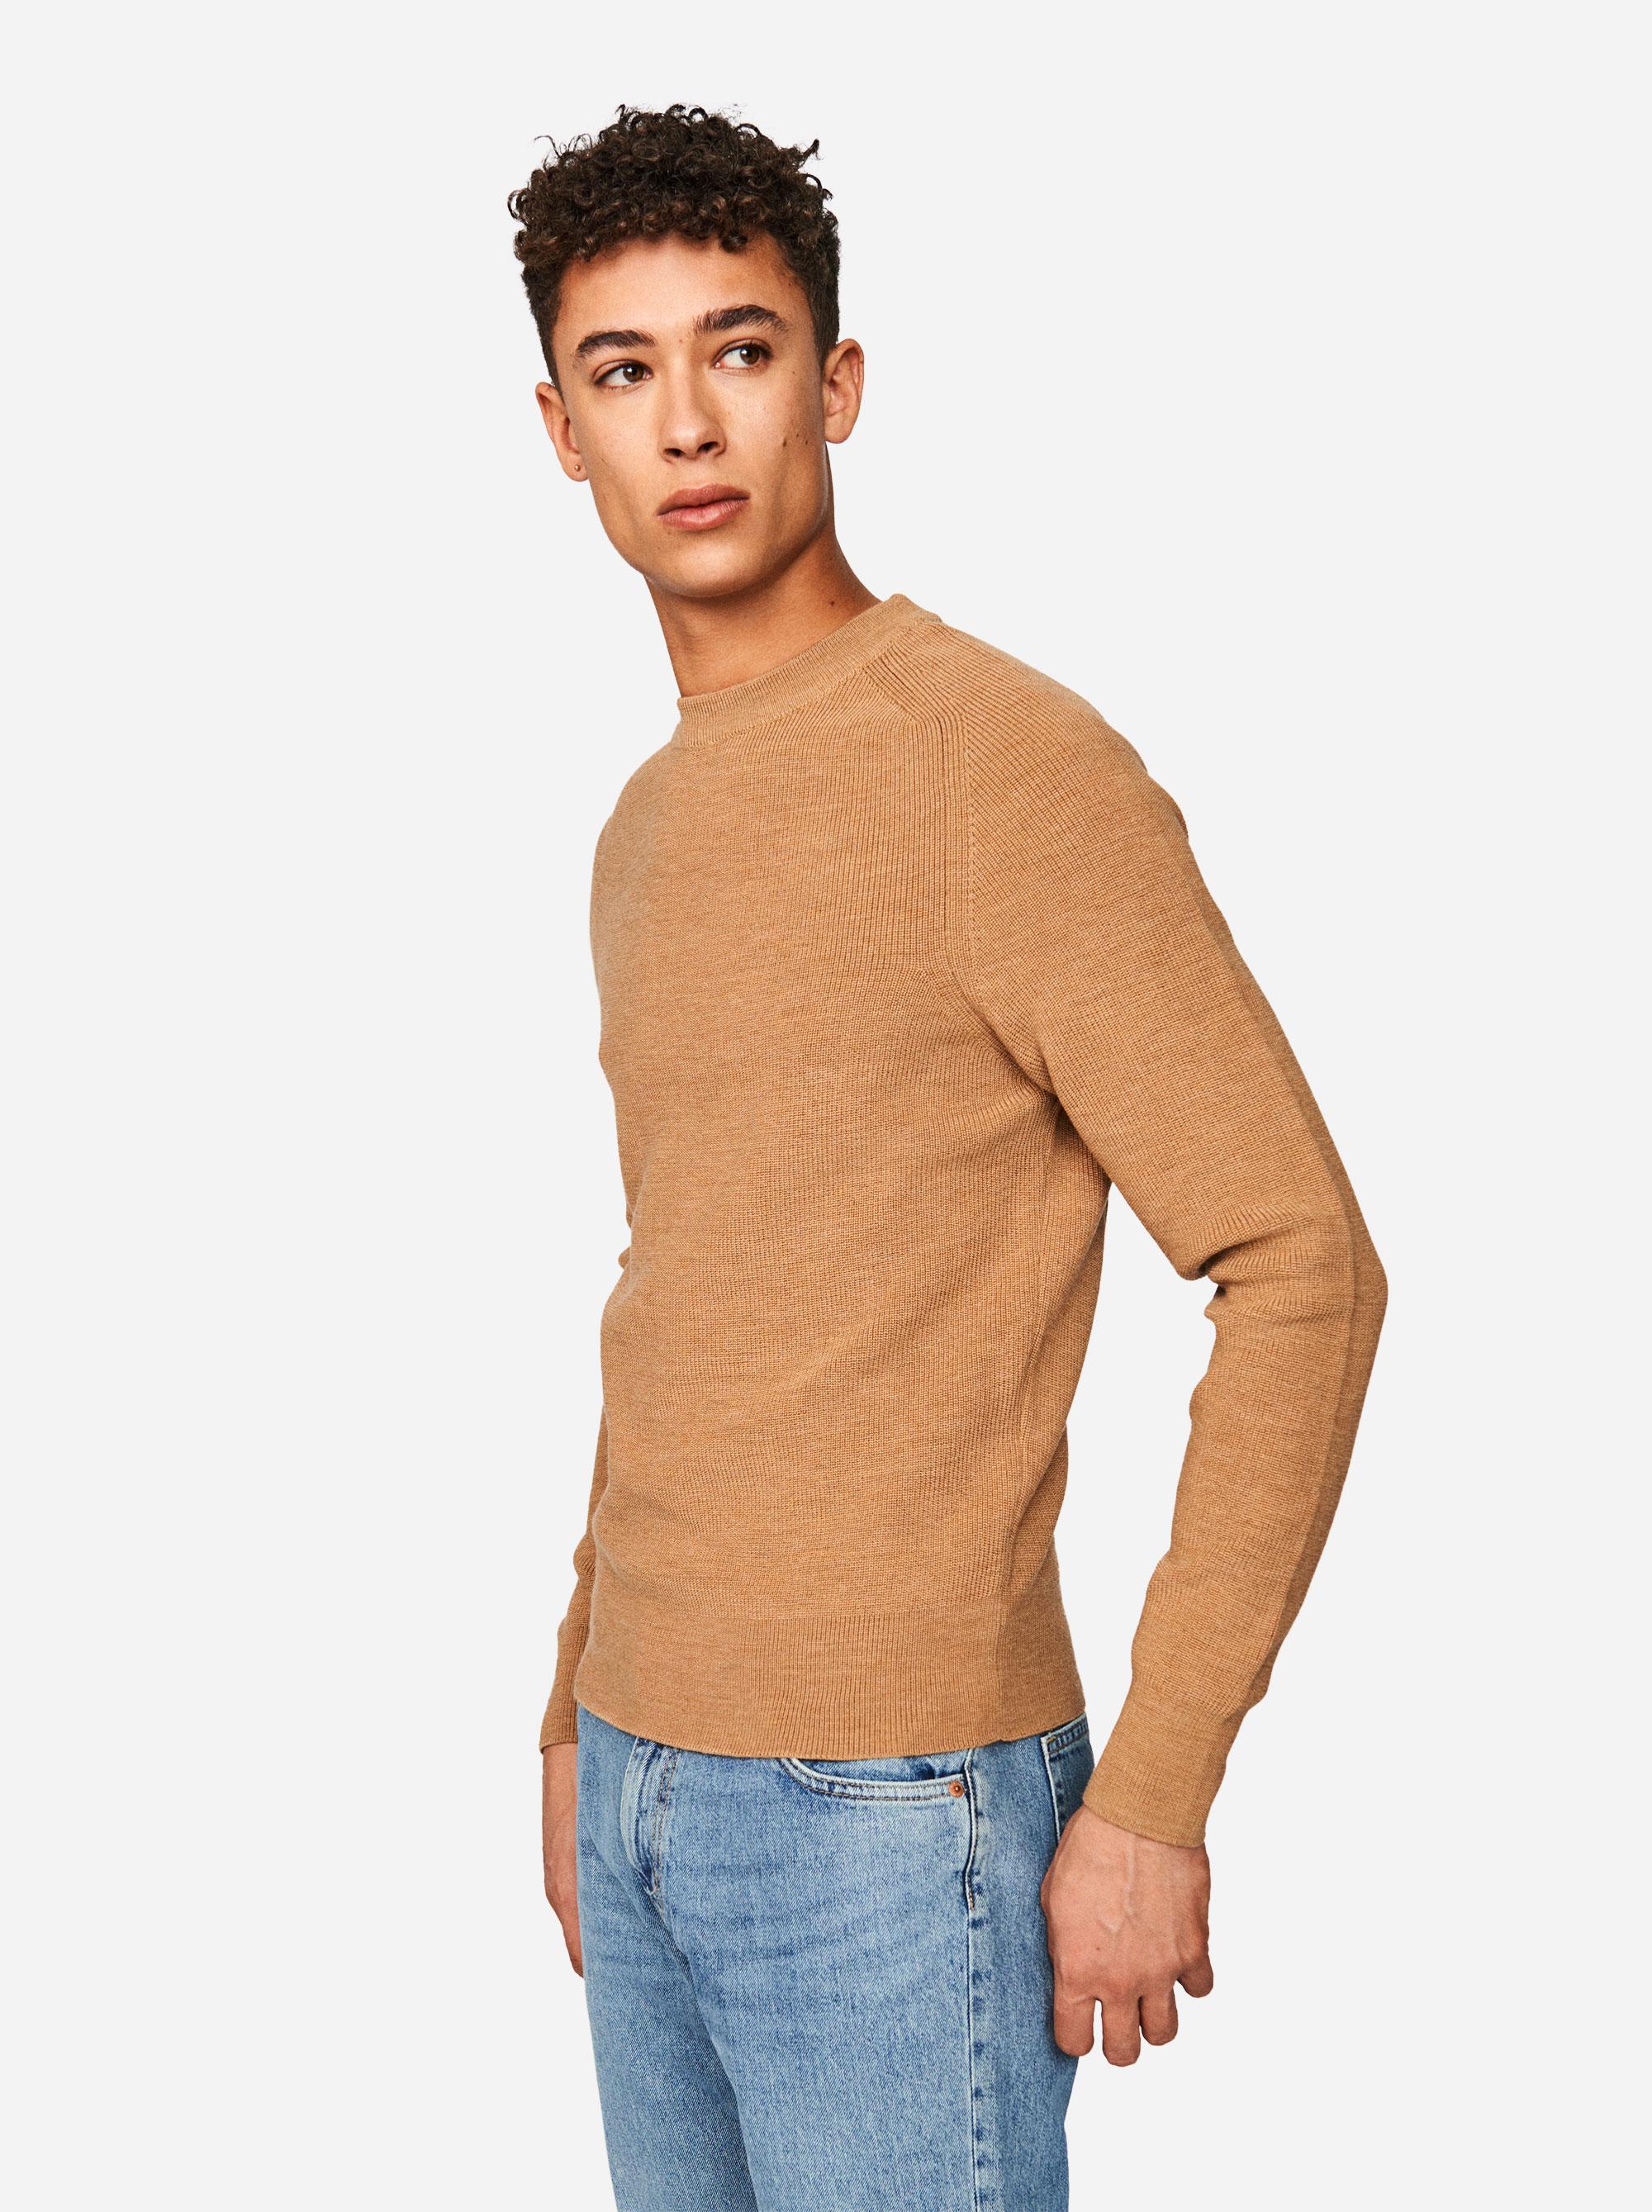 Teym - The Merino Sweater - Men - Camel - 1